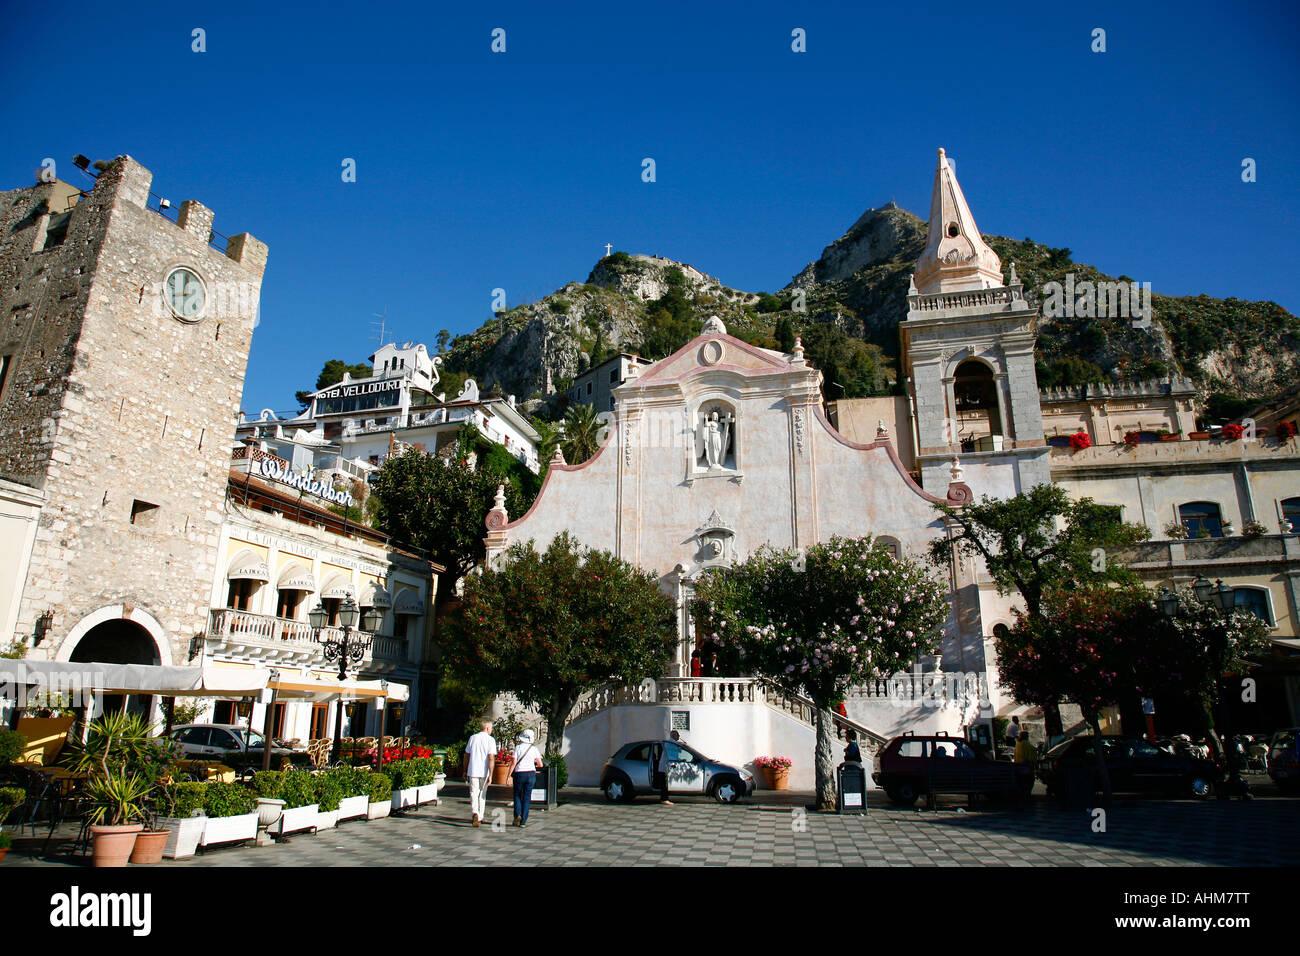 Piazza IX april with San Giuseppe church and the Mezzo gate Taormina Sicily Italy - Stock Image